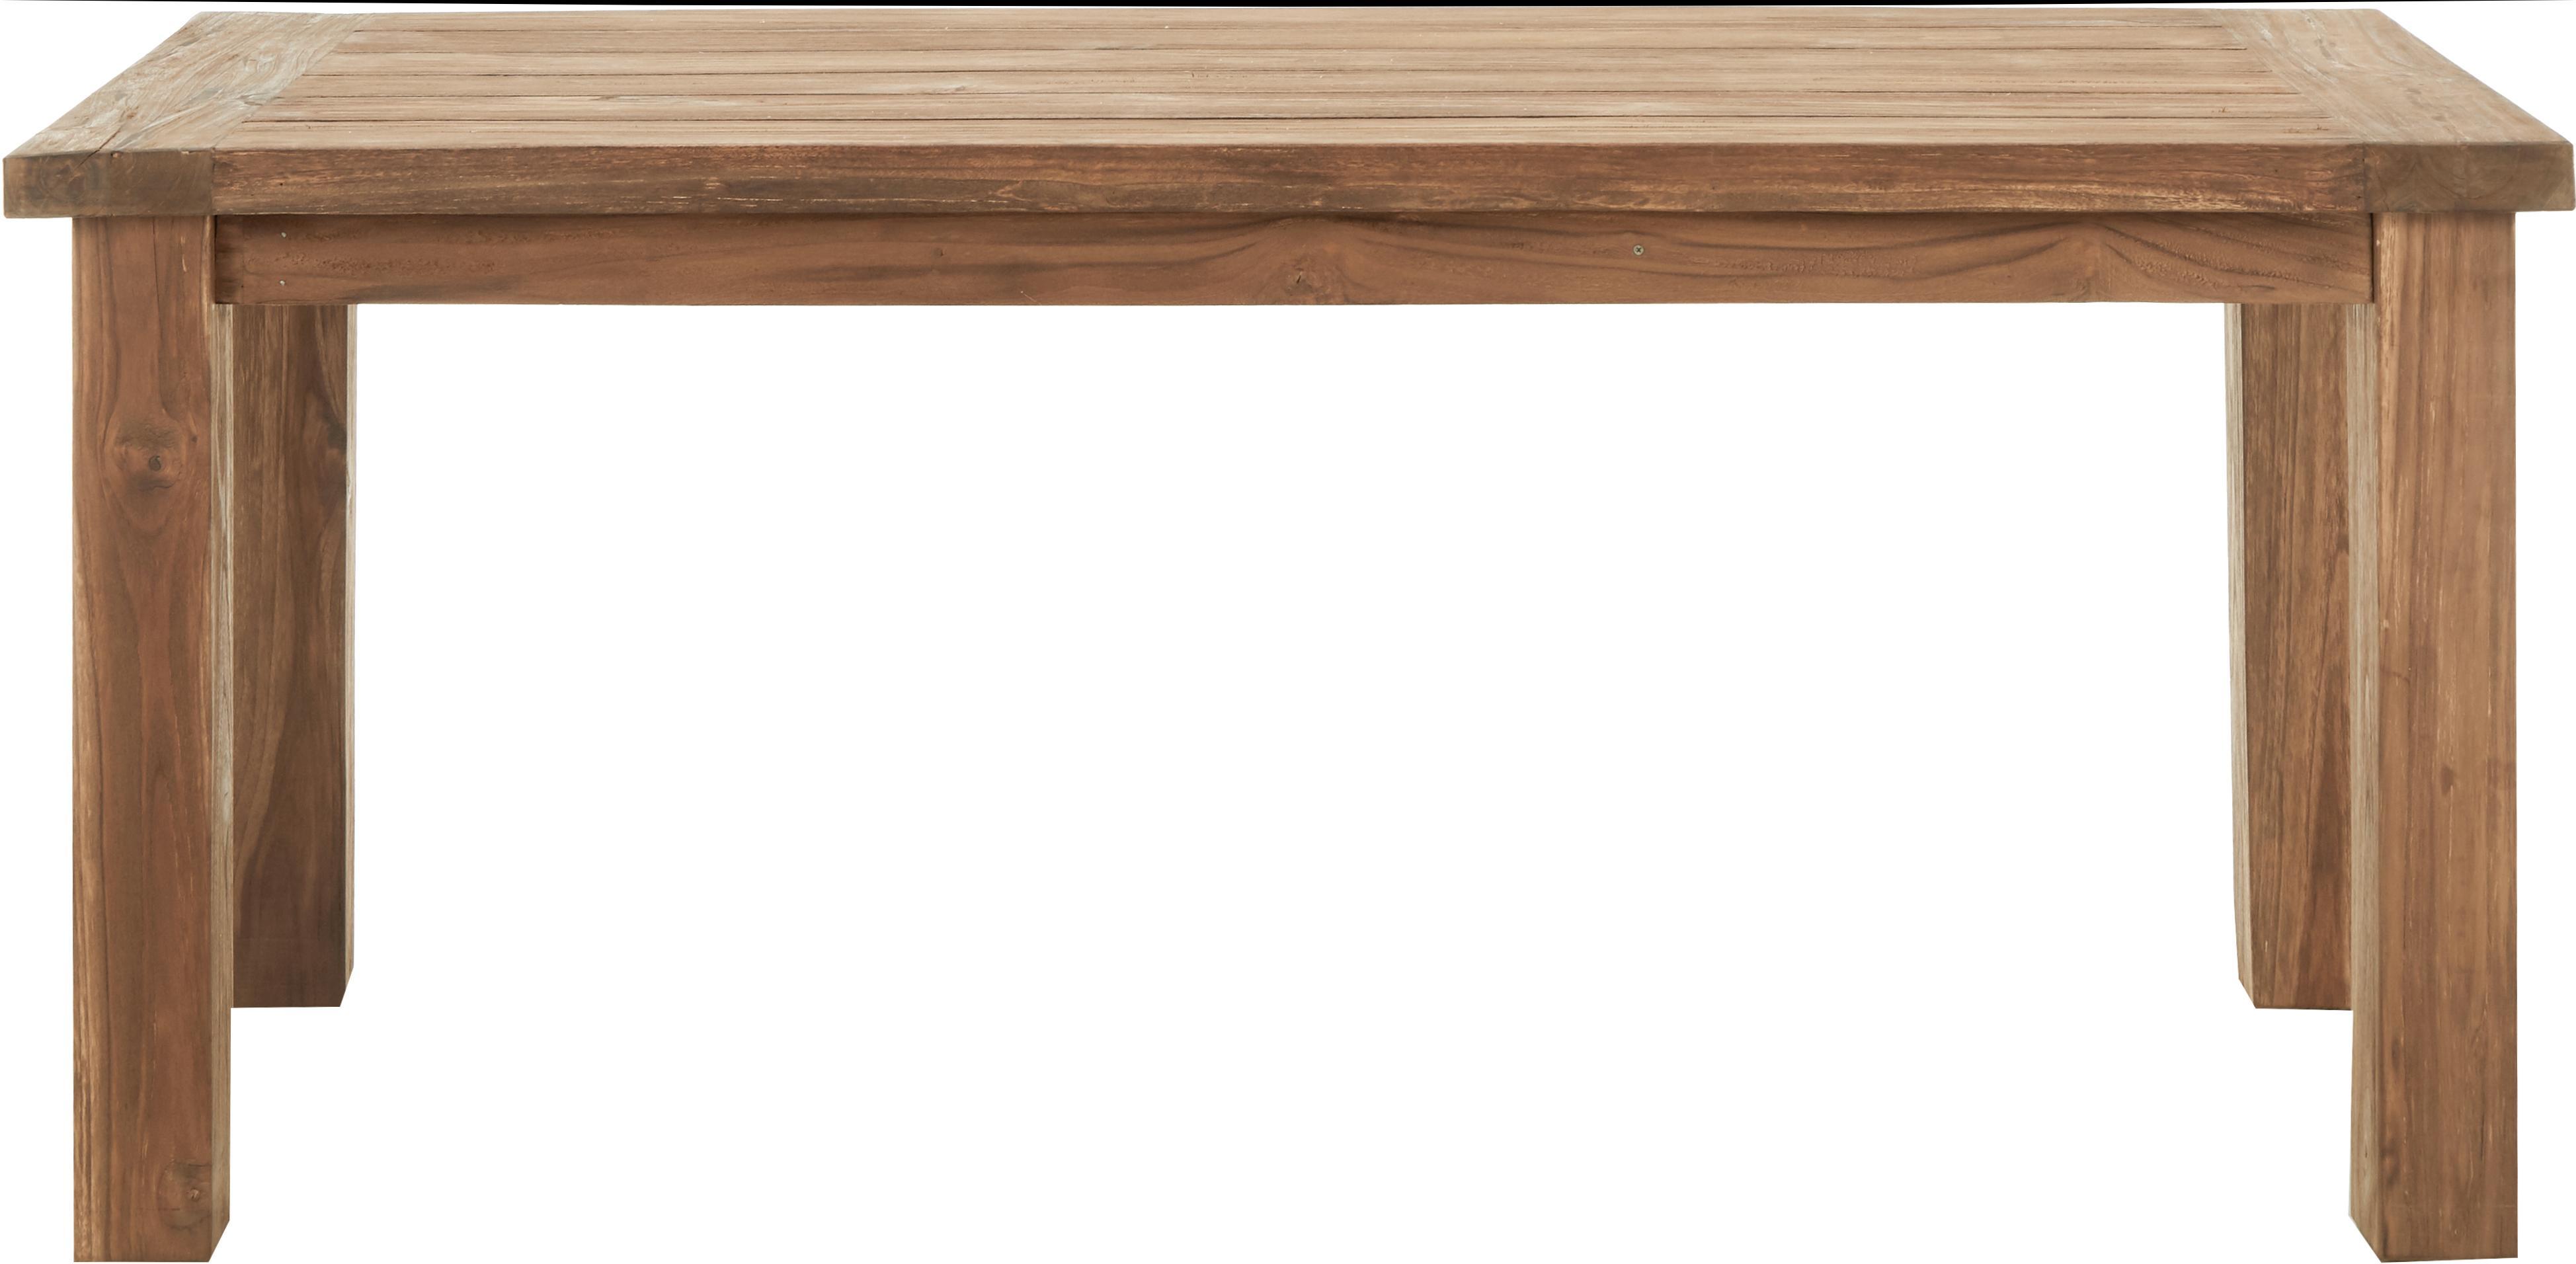 Eettafel Bois, Onbehandeld massief teakhout, Teakkleurig, B 180 x D 90 cm